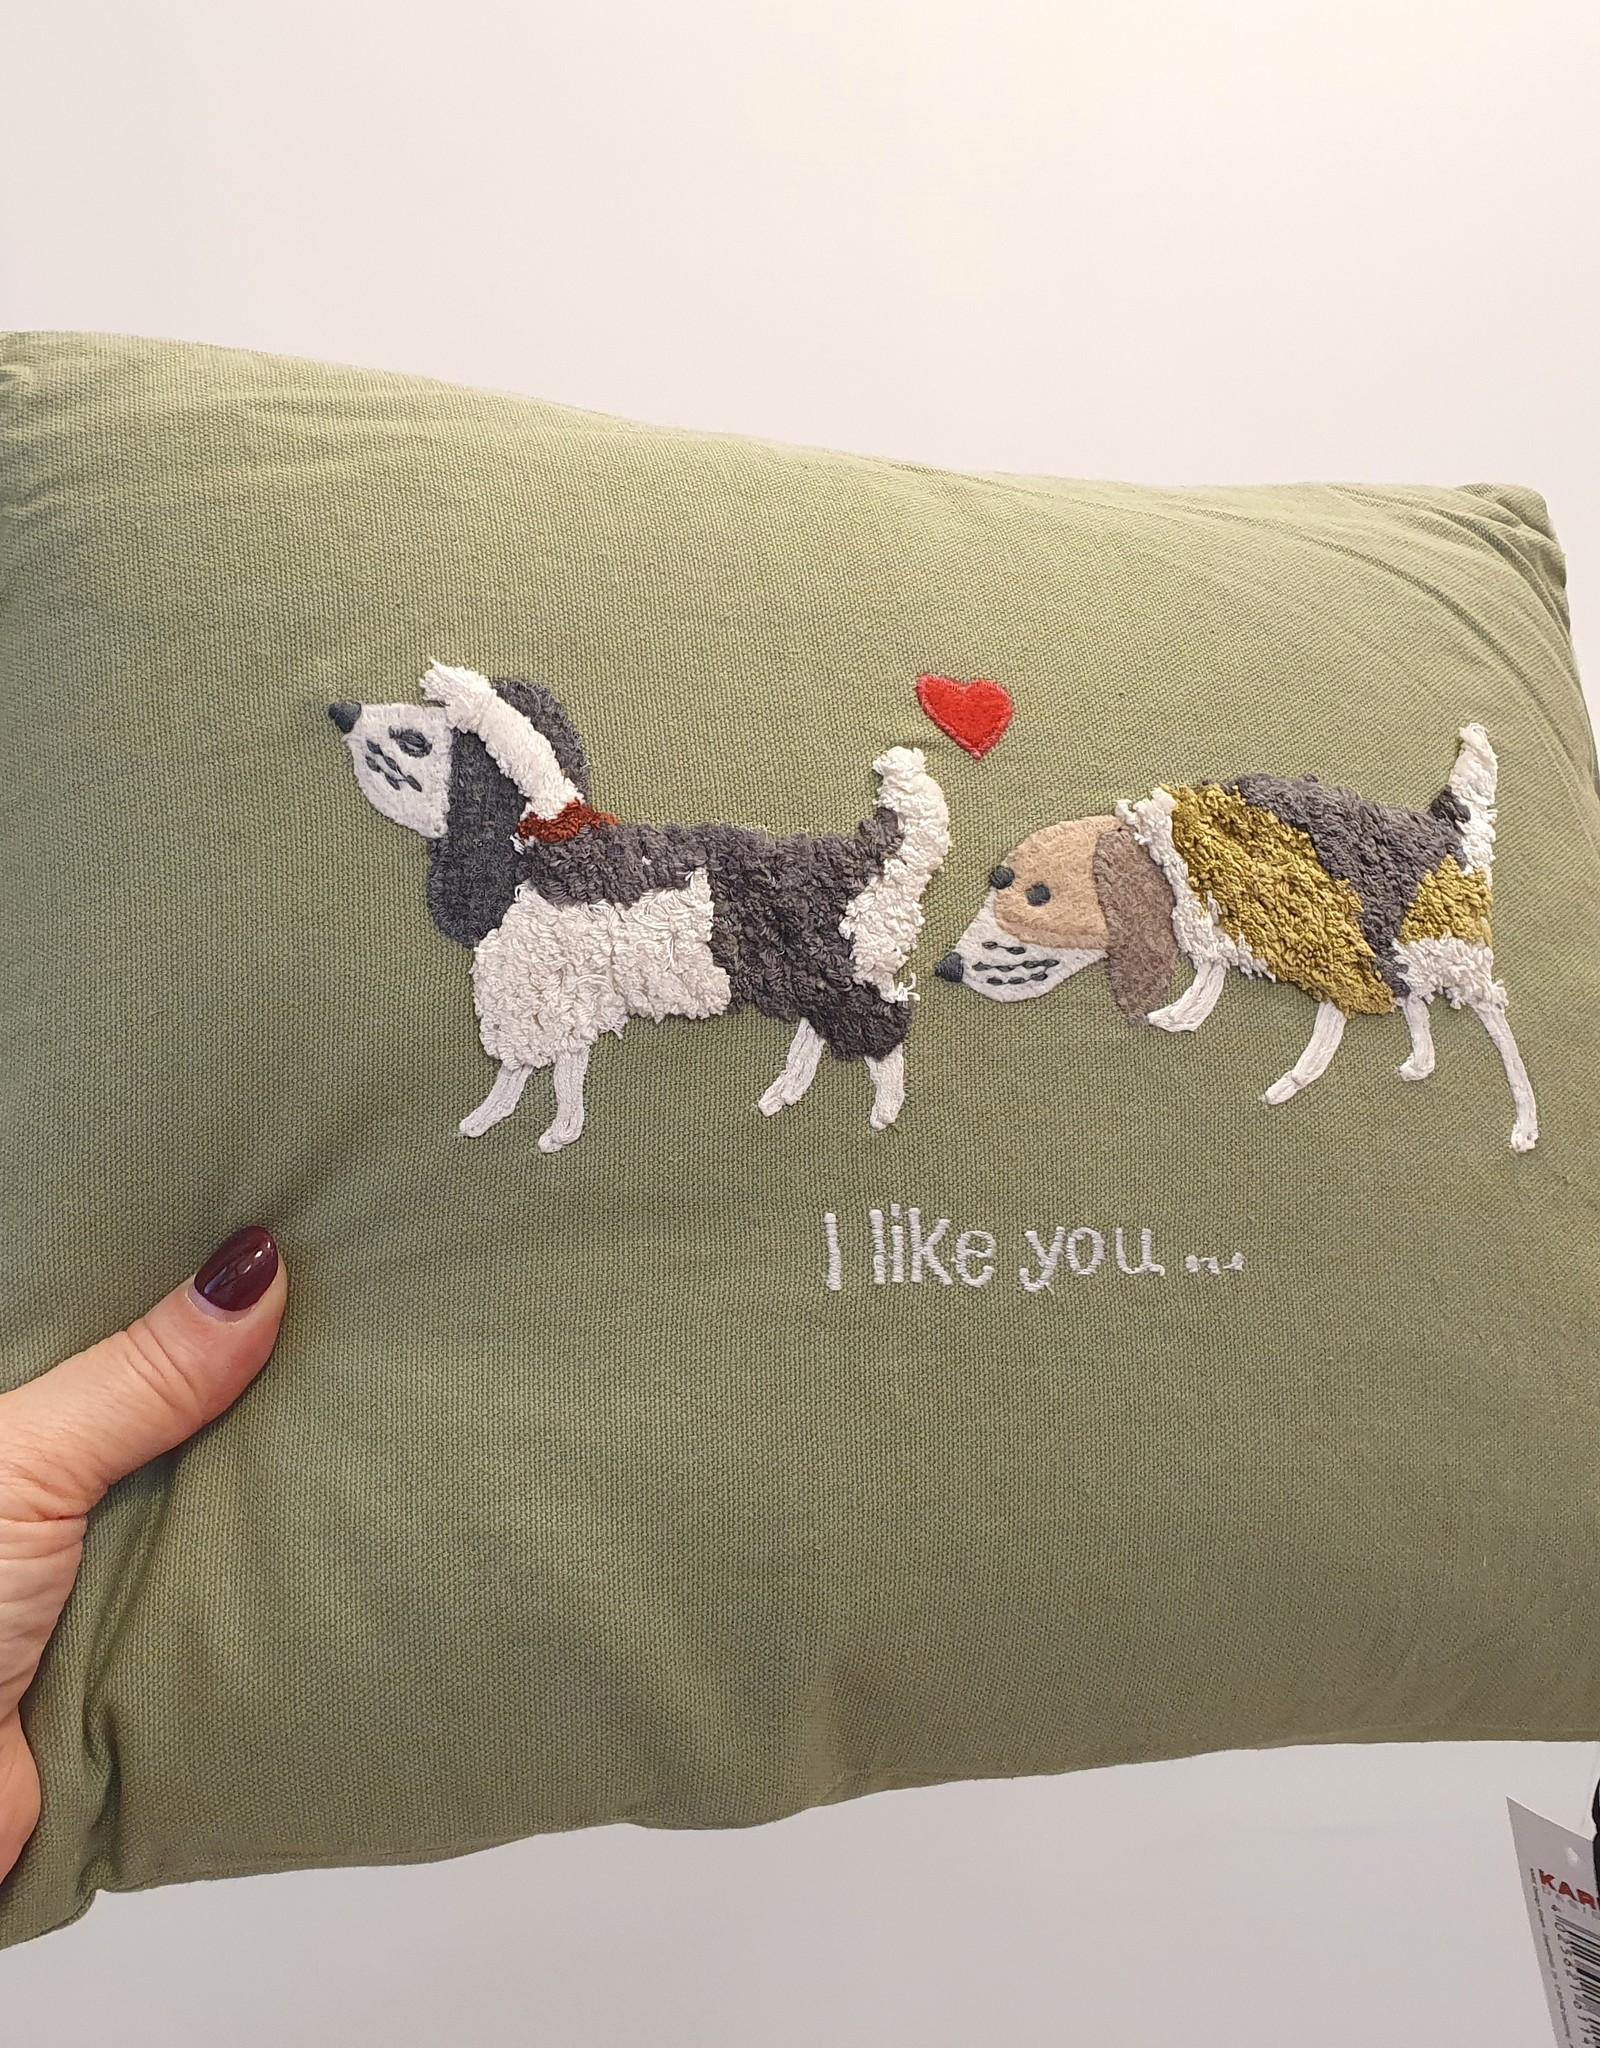 KARE DESIGN Cushion Fairytale Like you 40x30cm